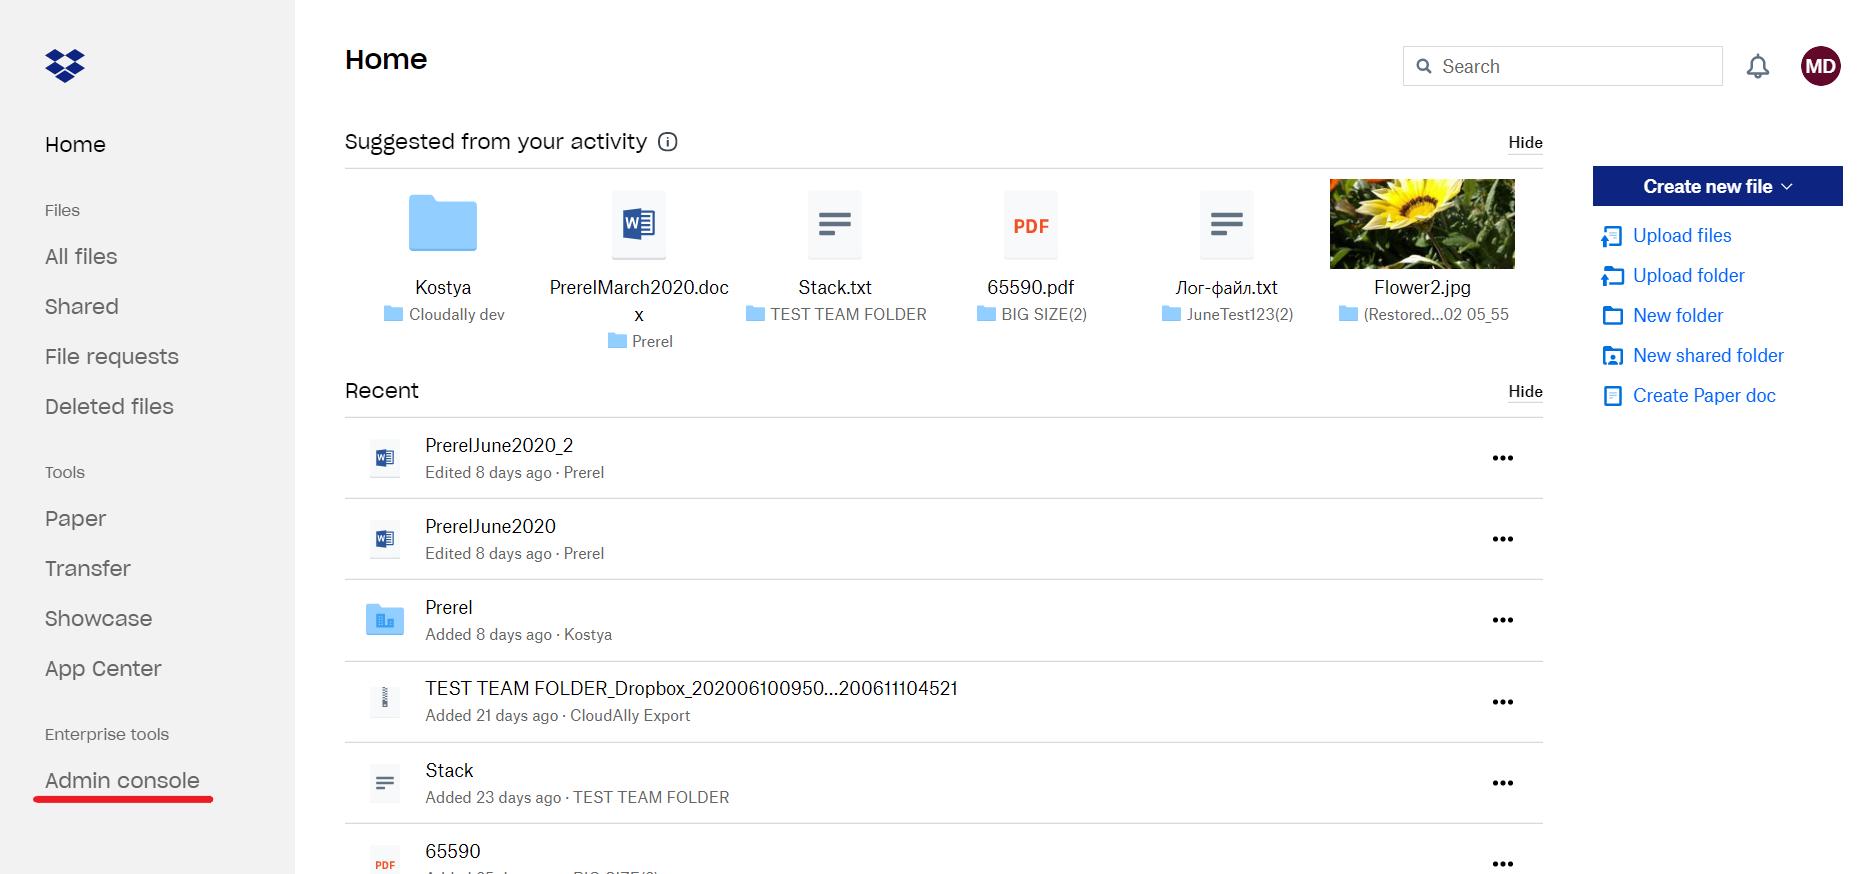 Dropbox_-_Google_Chrome_2020-07-03_11.54.09.png